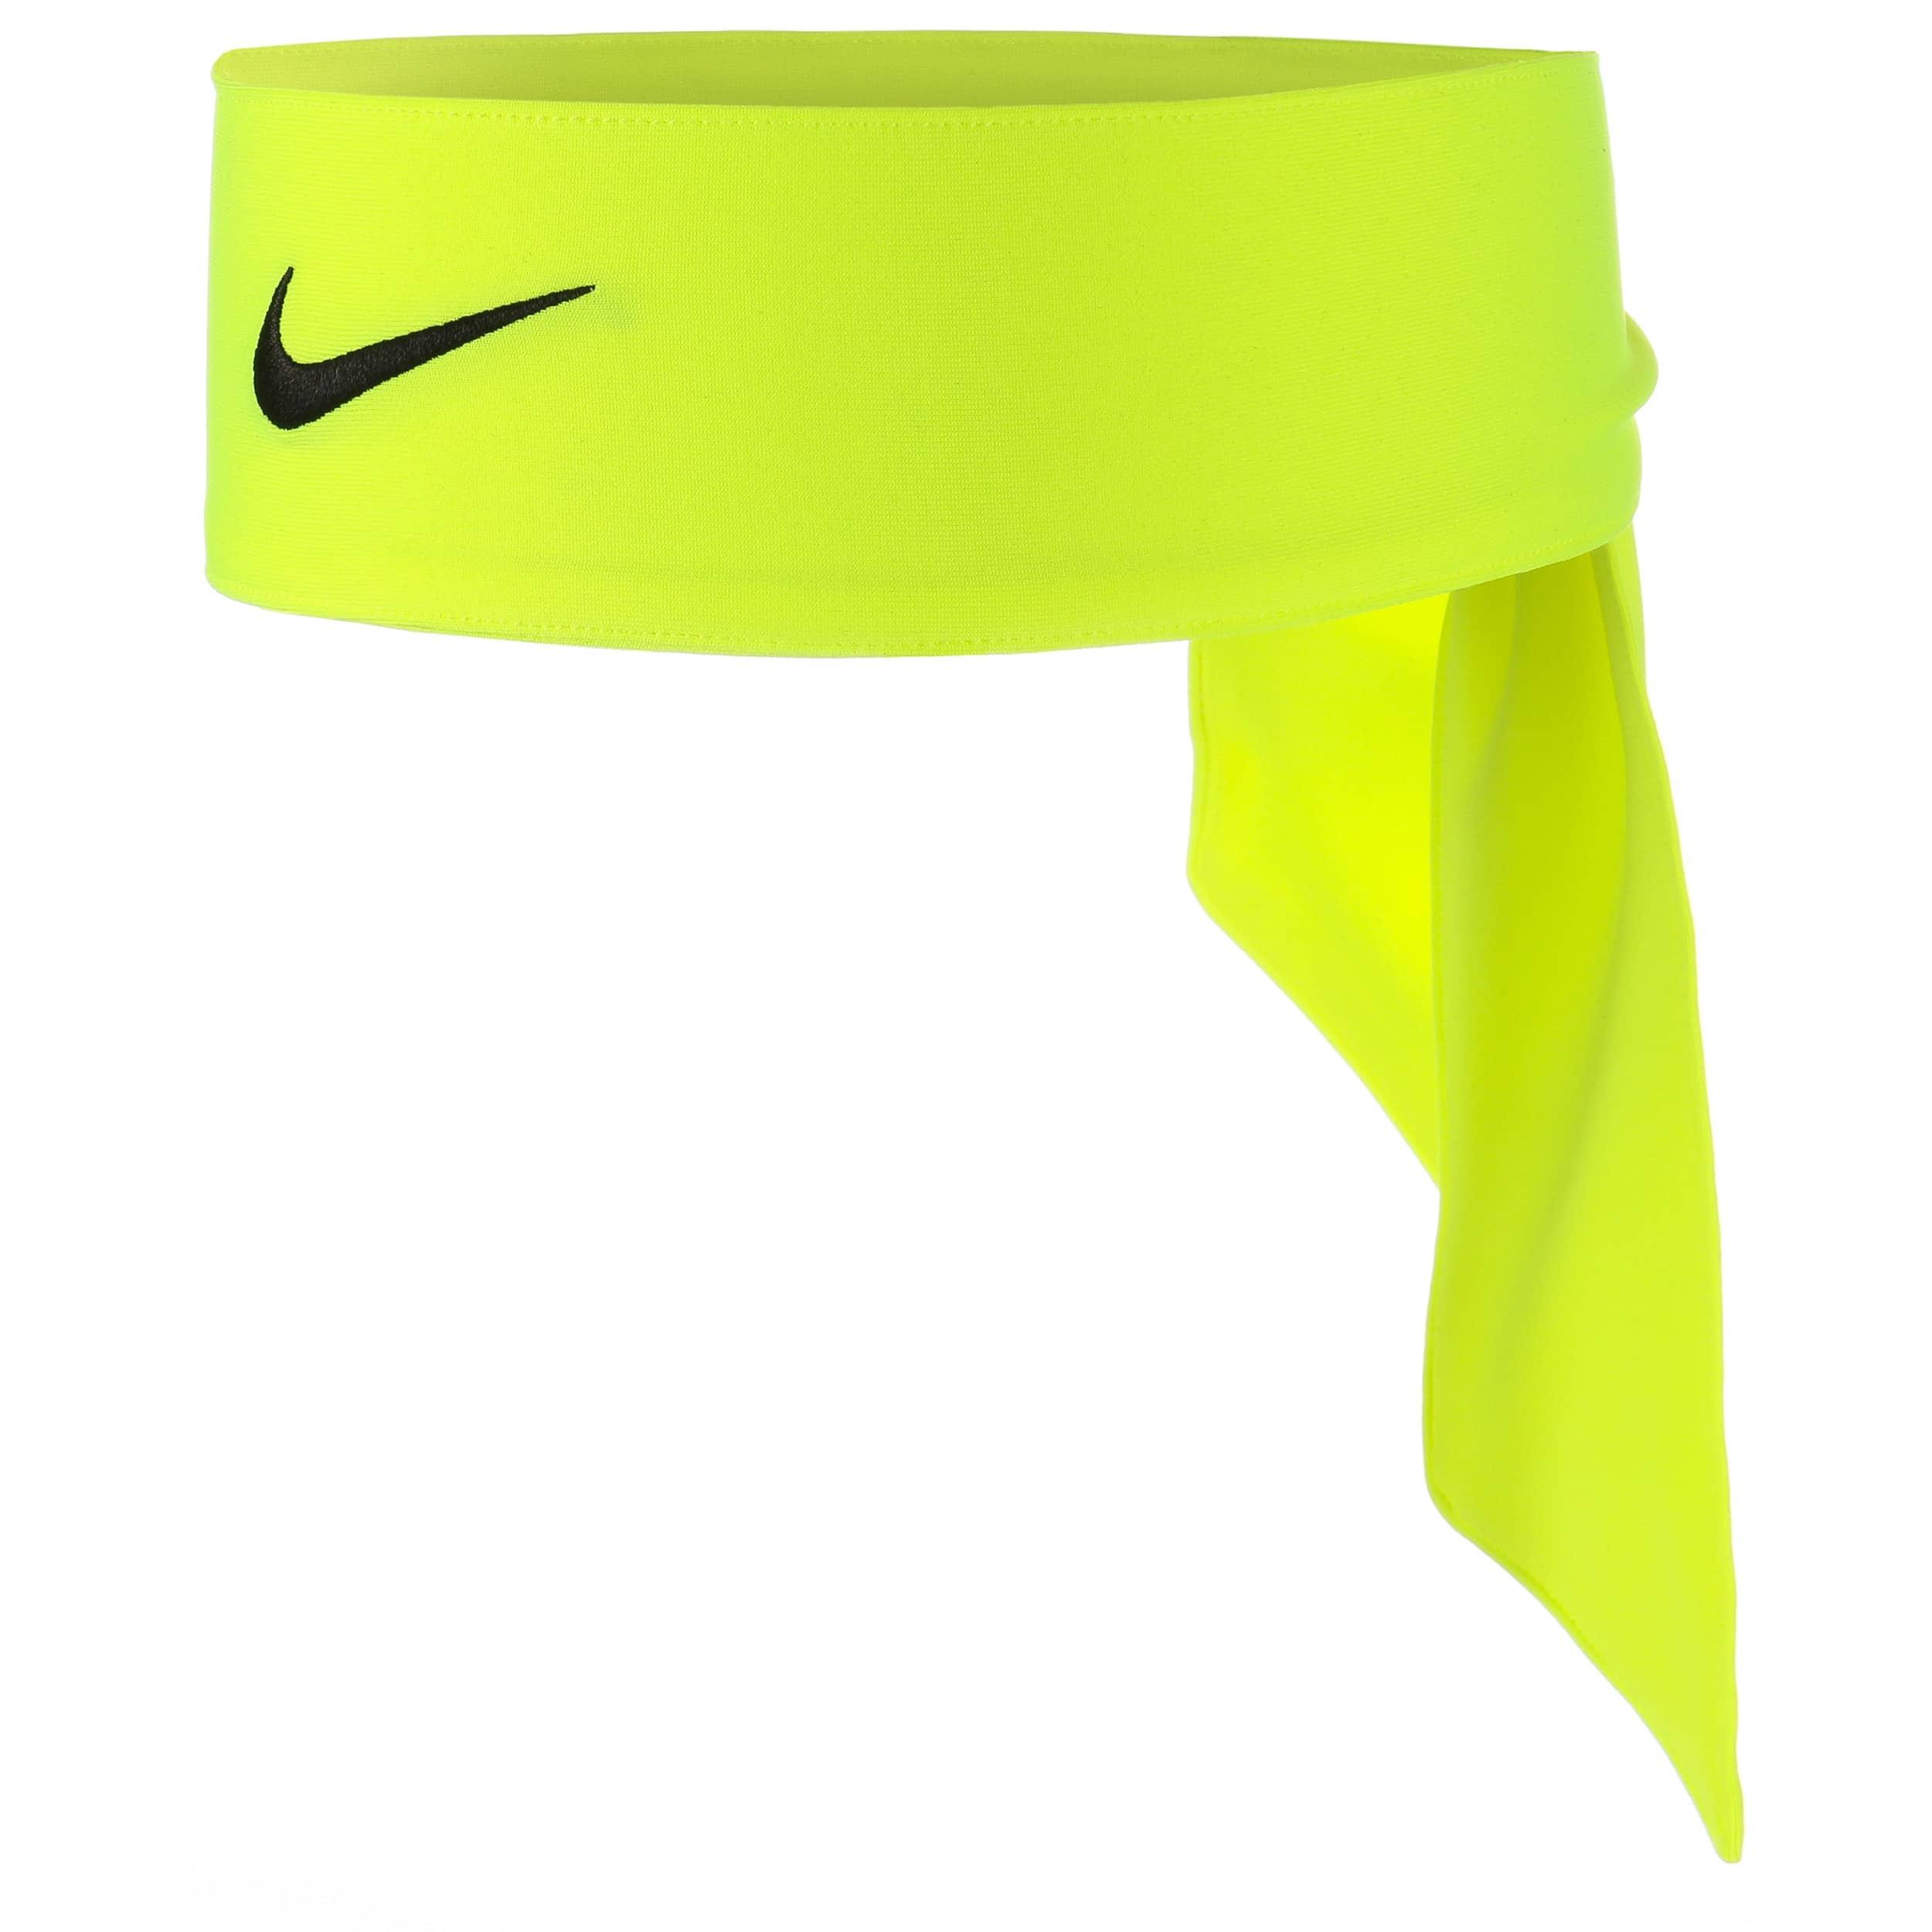 ... Nike Dri-Fit Head Tie 2.0 Headband by Nike - neon yellow 4 ... 6b5c2702cd9